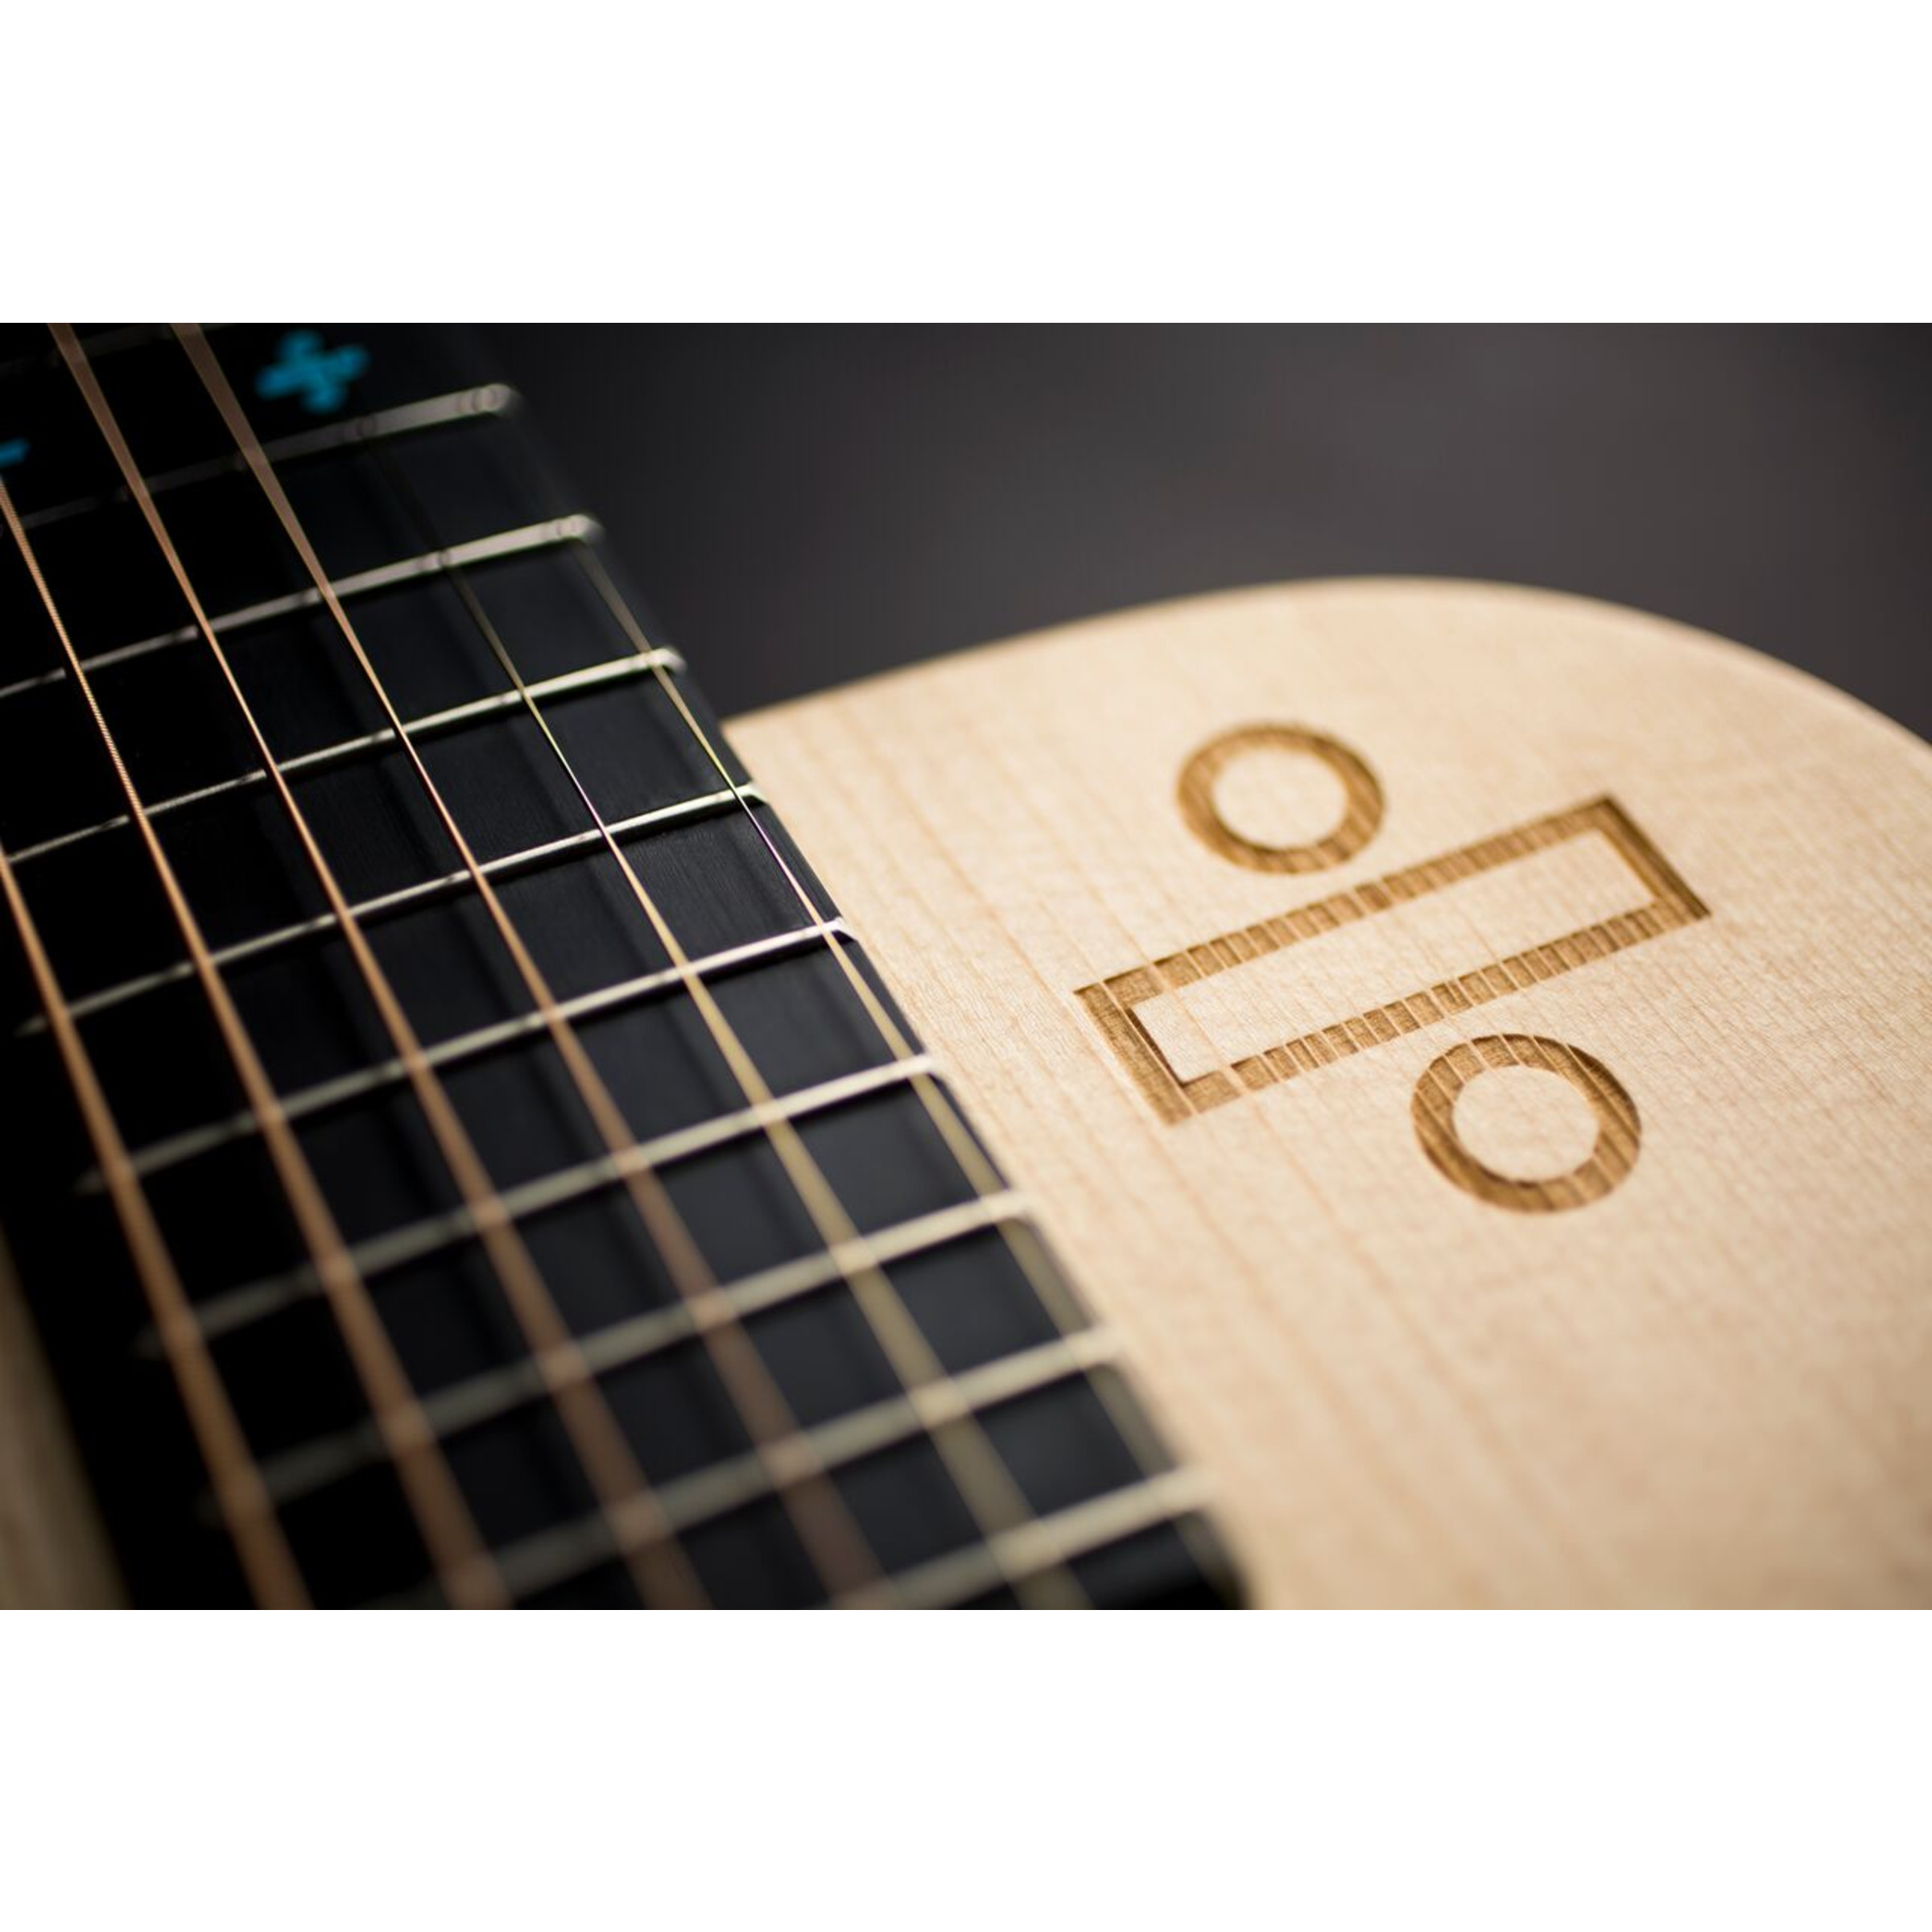 guitars martin ed sheeran 39 divide 39 signature guitar giggear. Black Bedroom Furniture Sets. Home Design Ideas